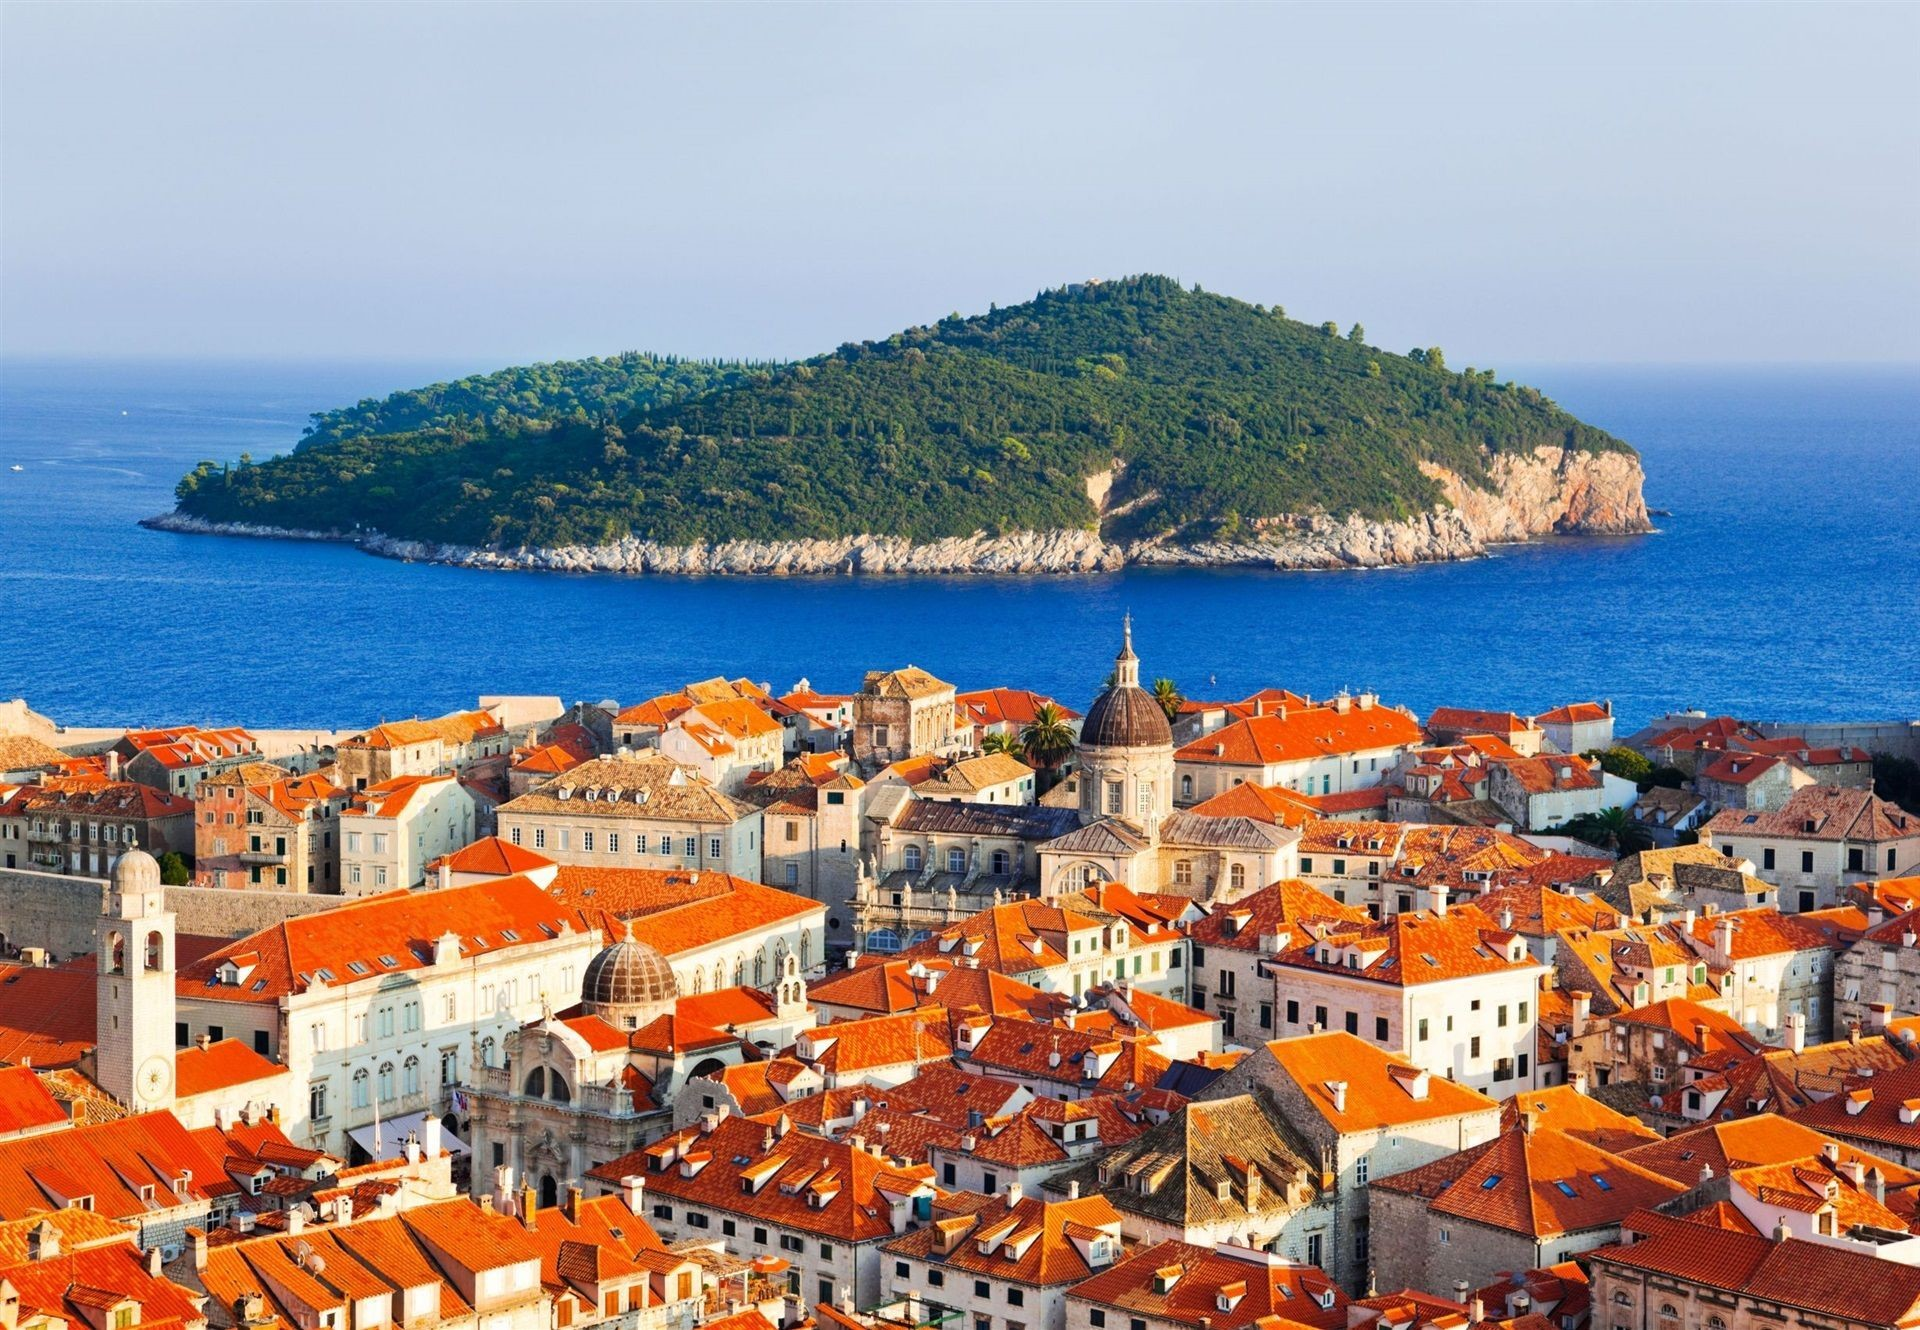 Experiência Erasmus em Dubrovnik, Croácia - Amaya